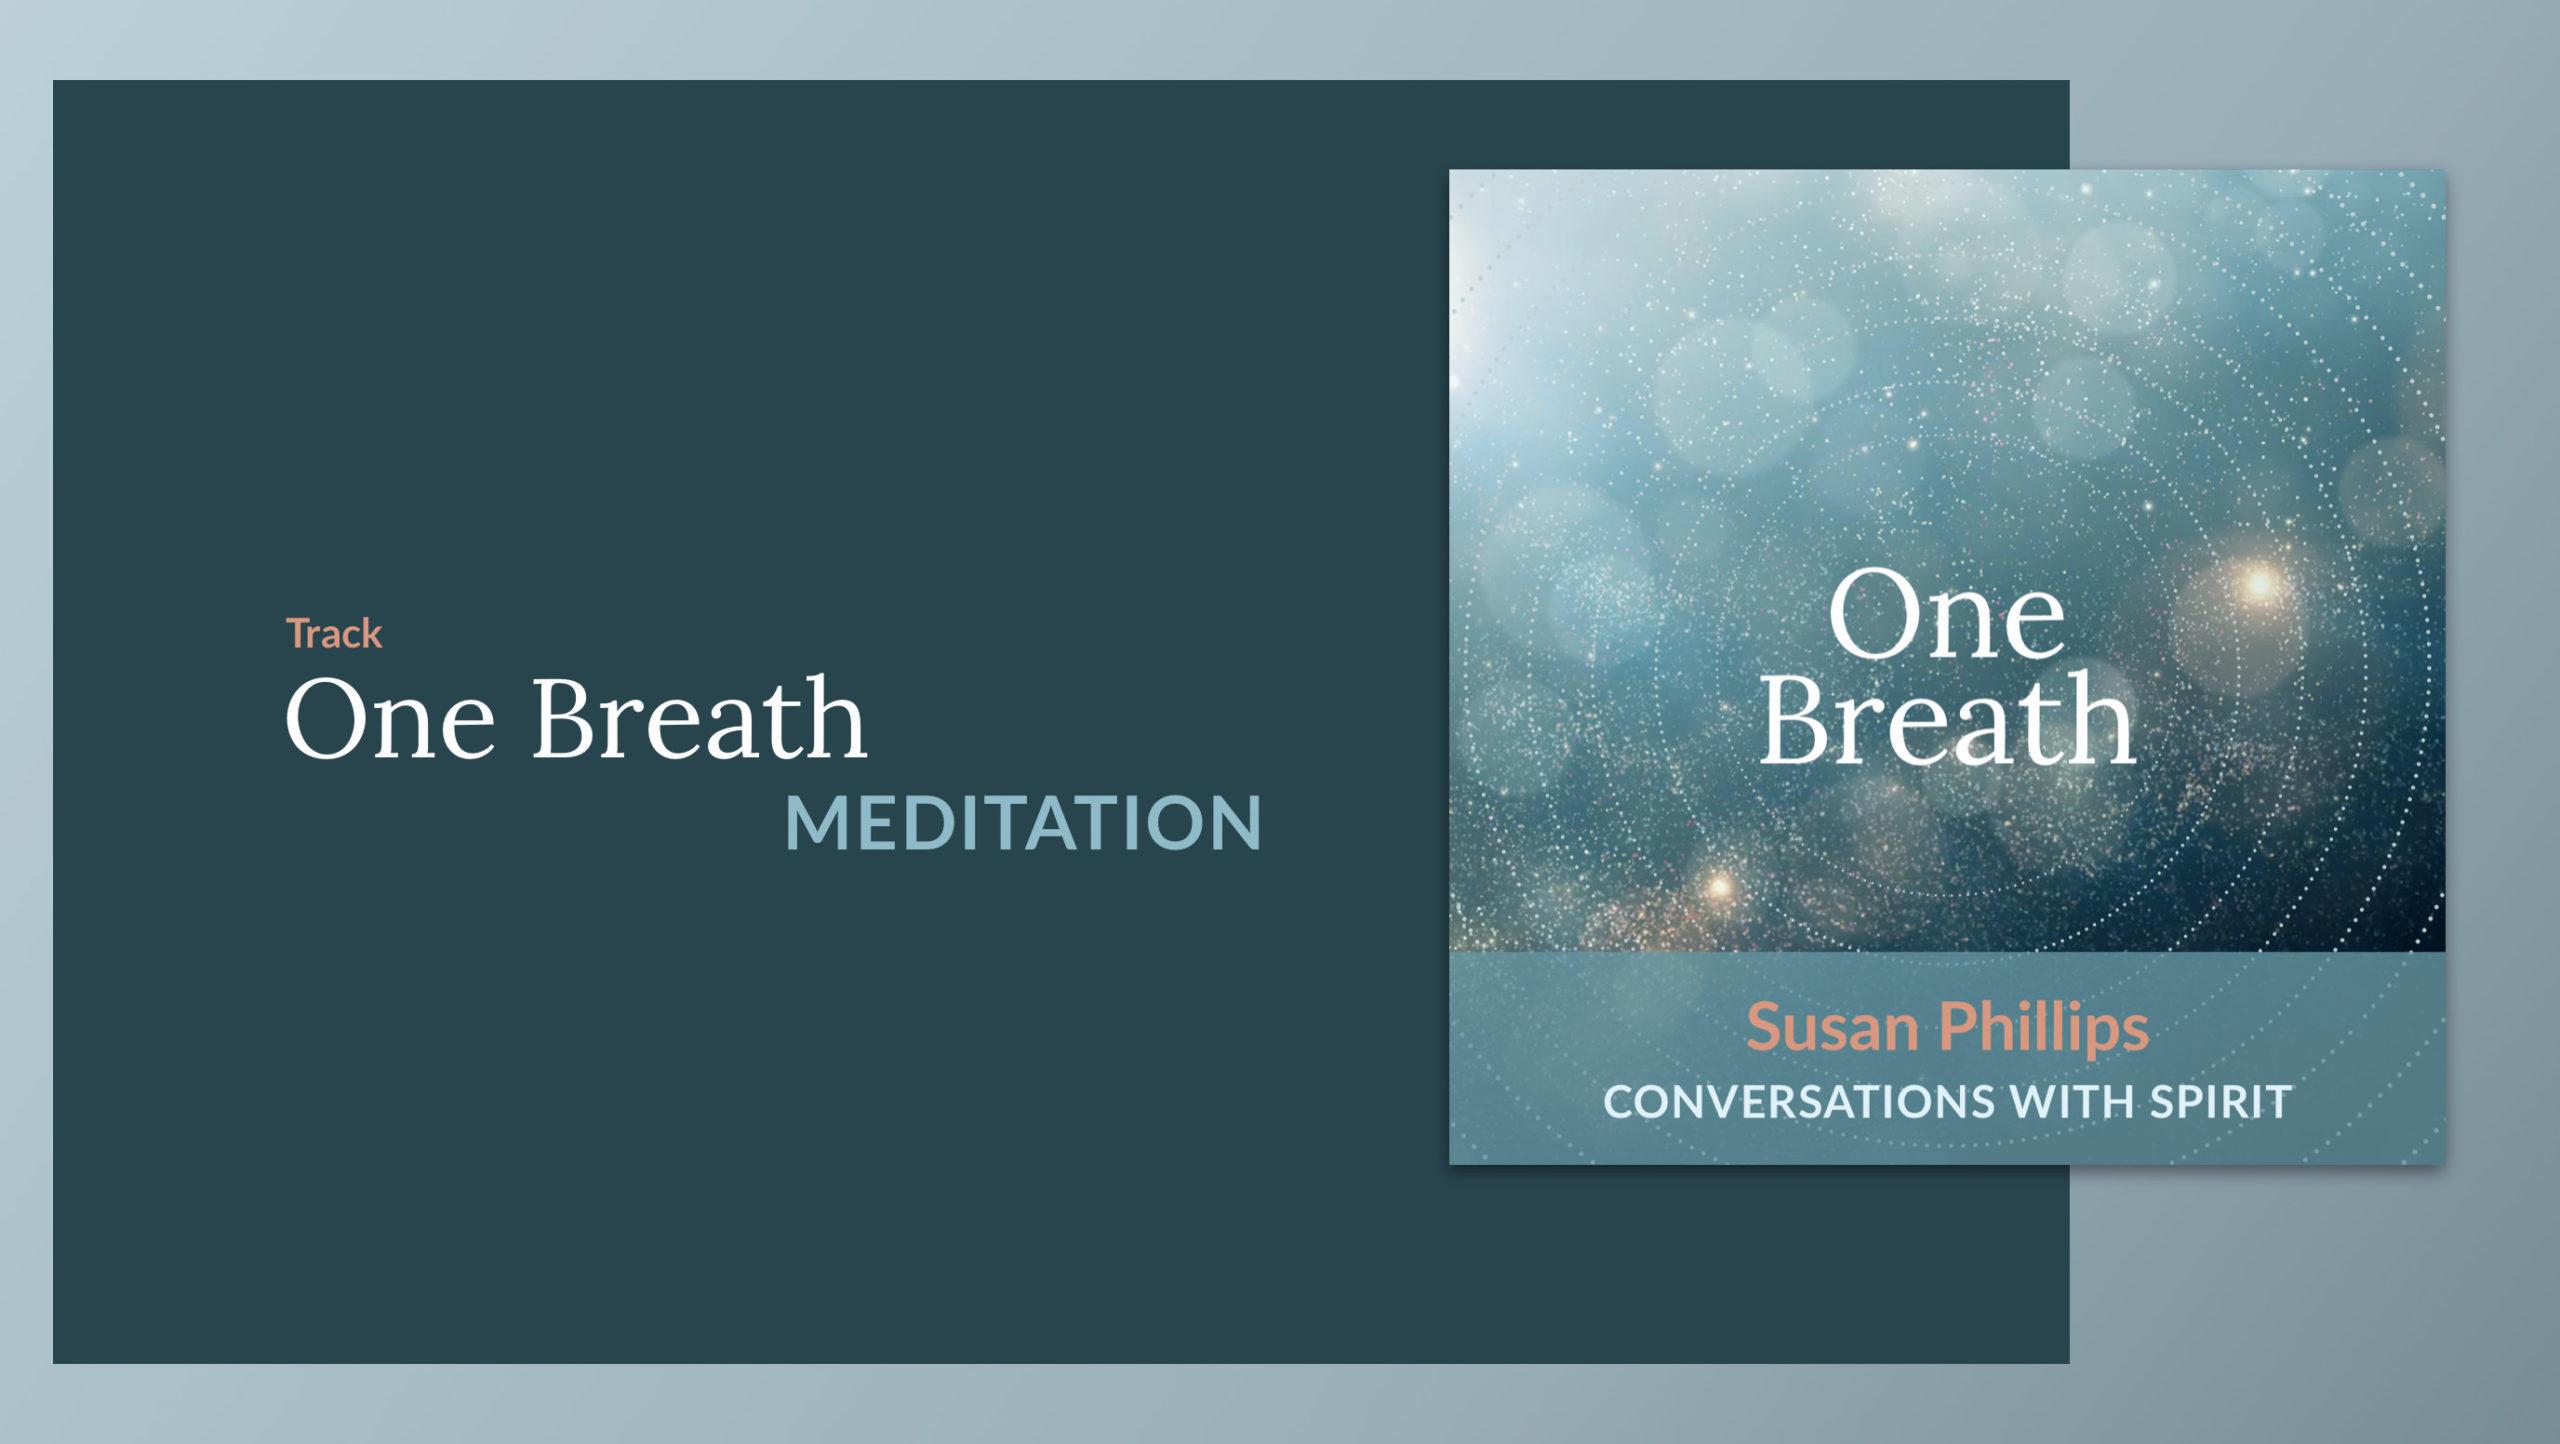 Track Art - One Breath